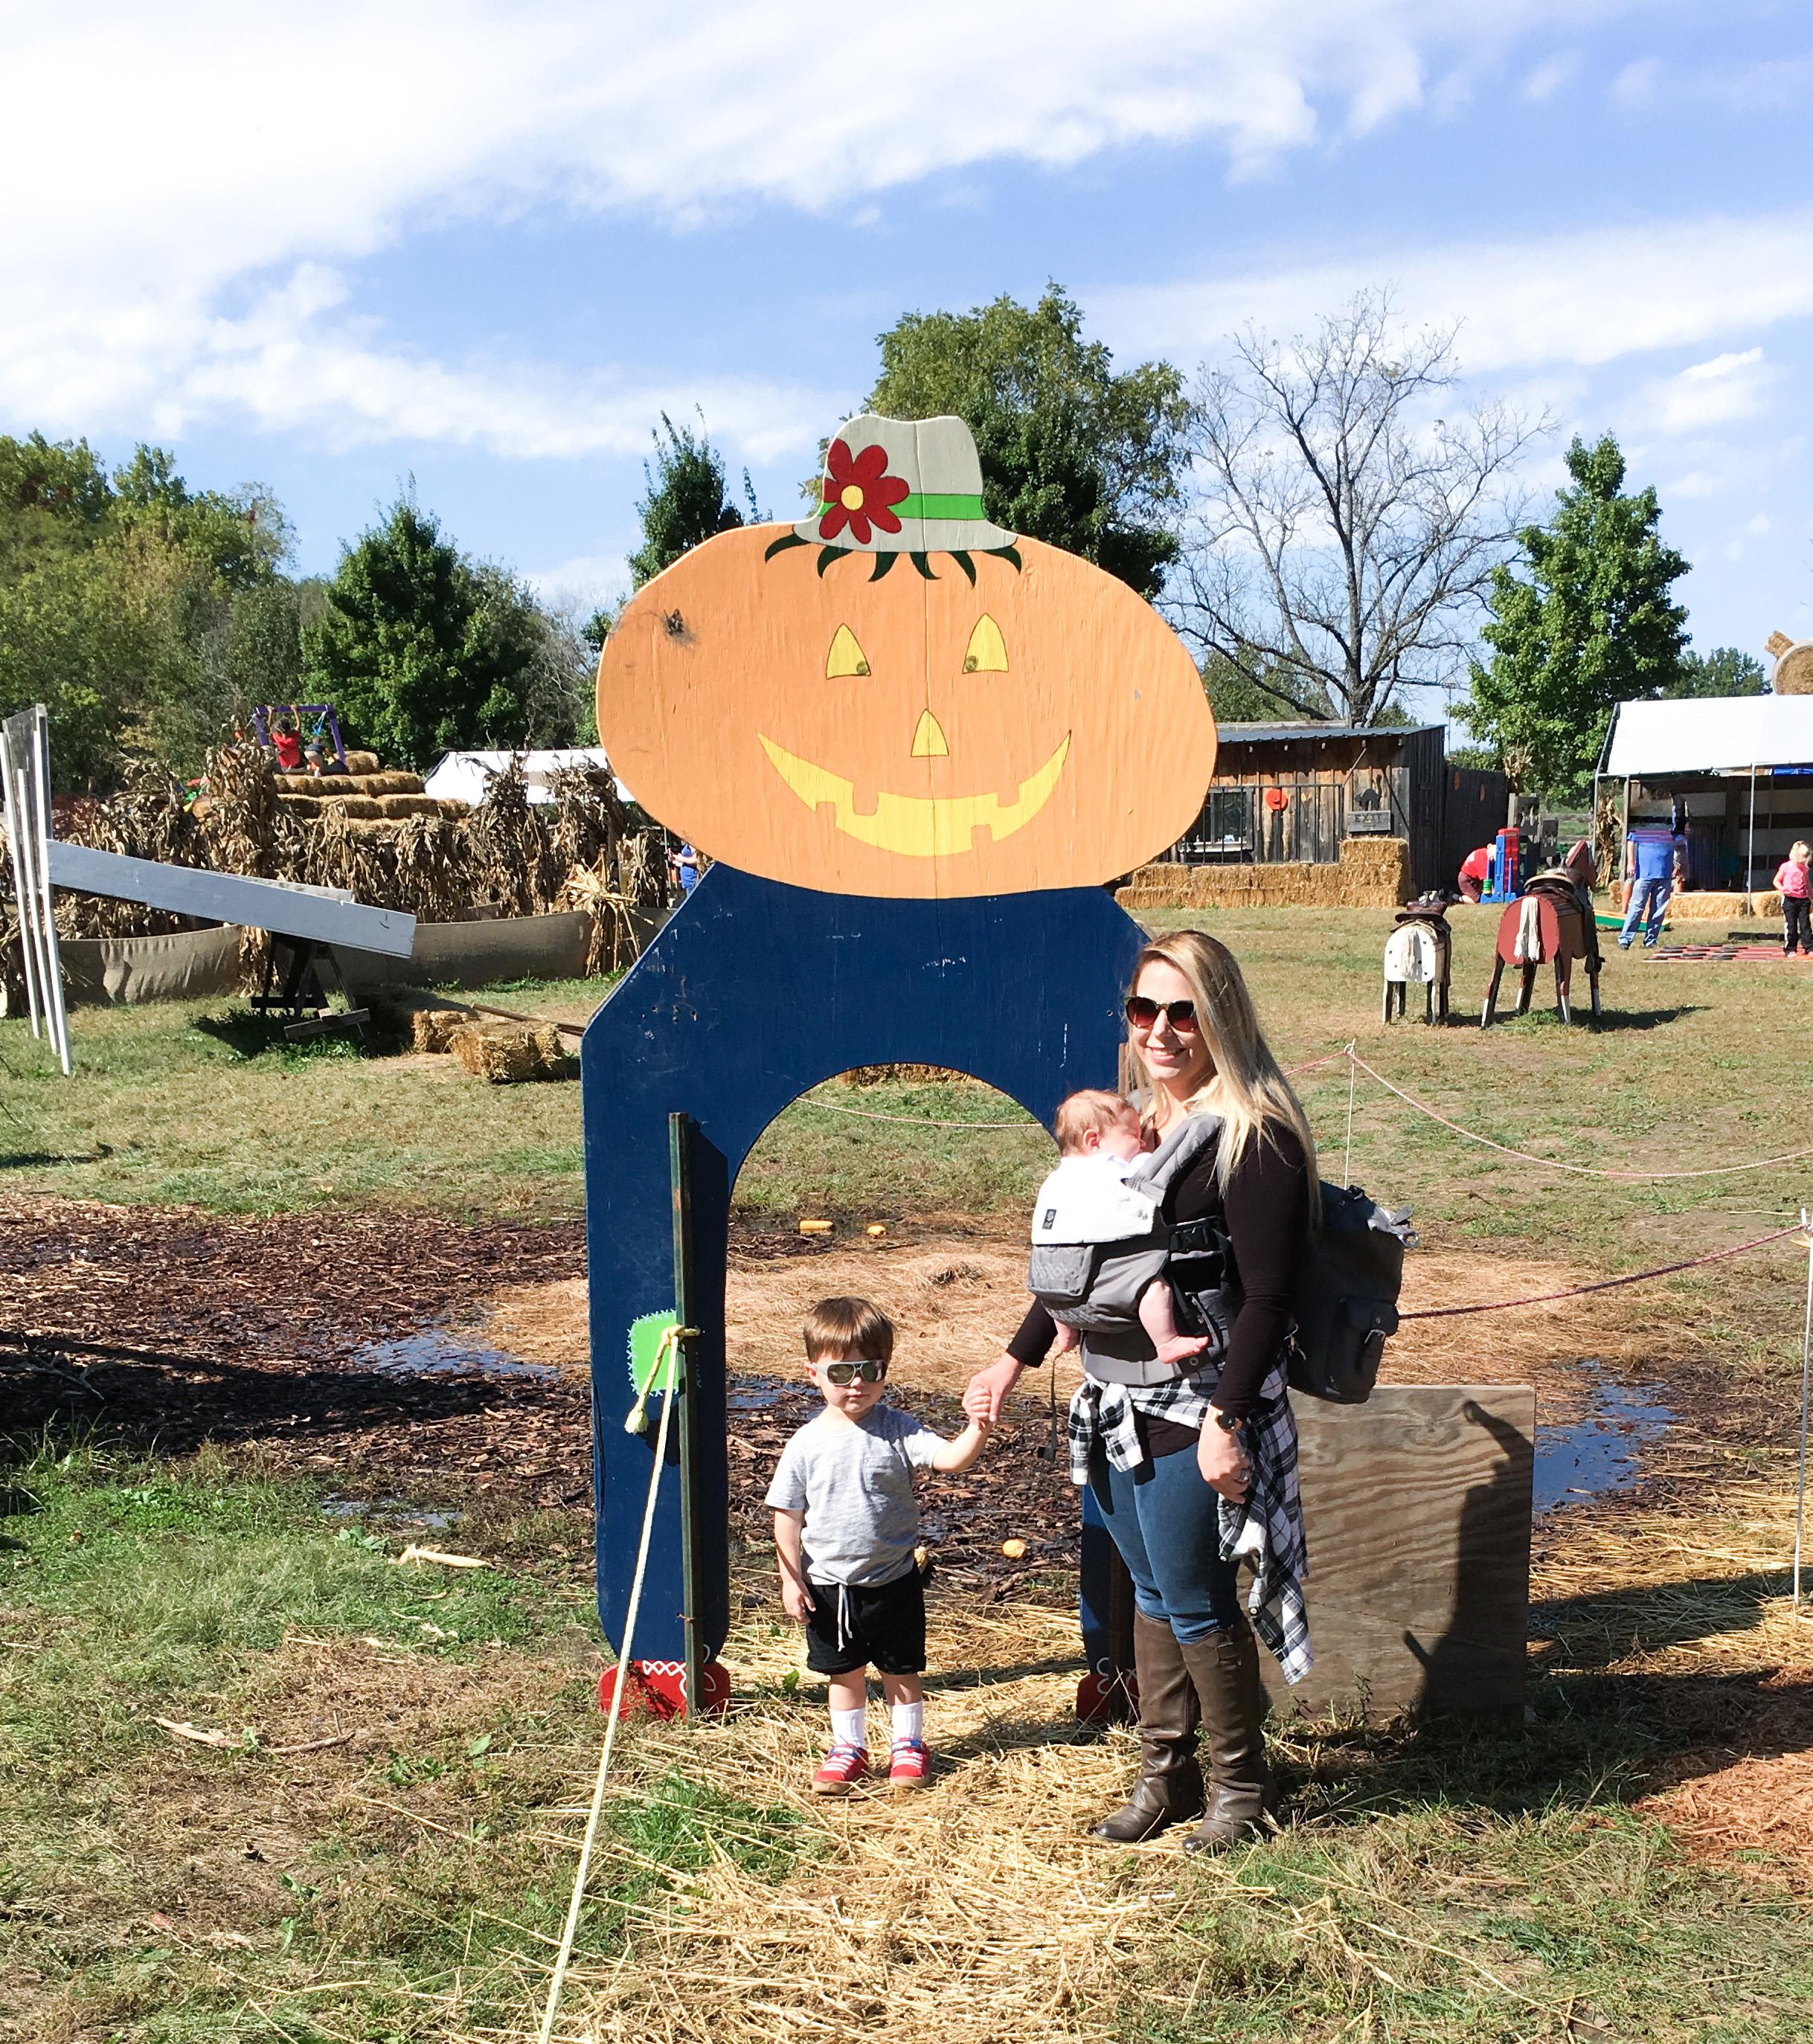 Fall Family Fun at Pumpkin Patch